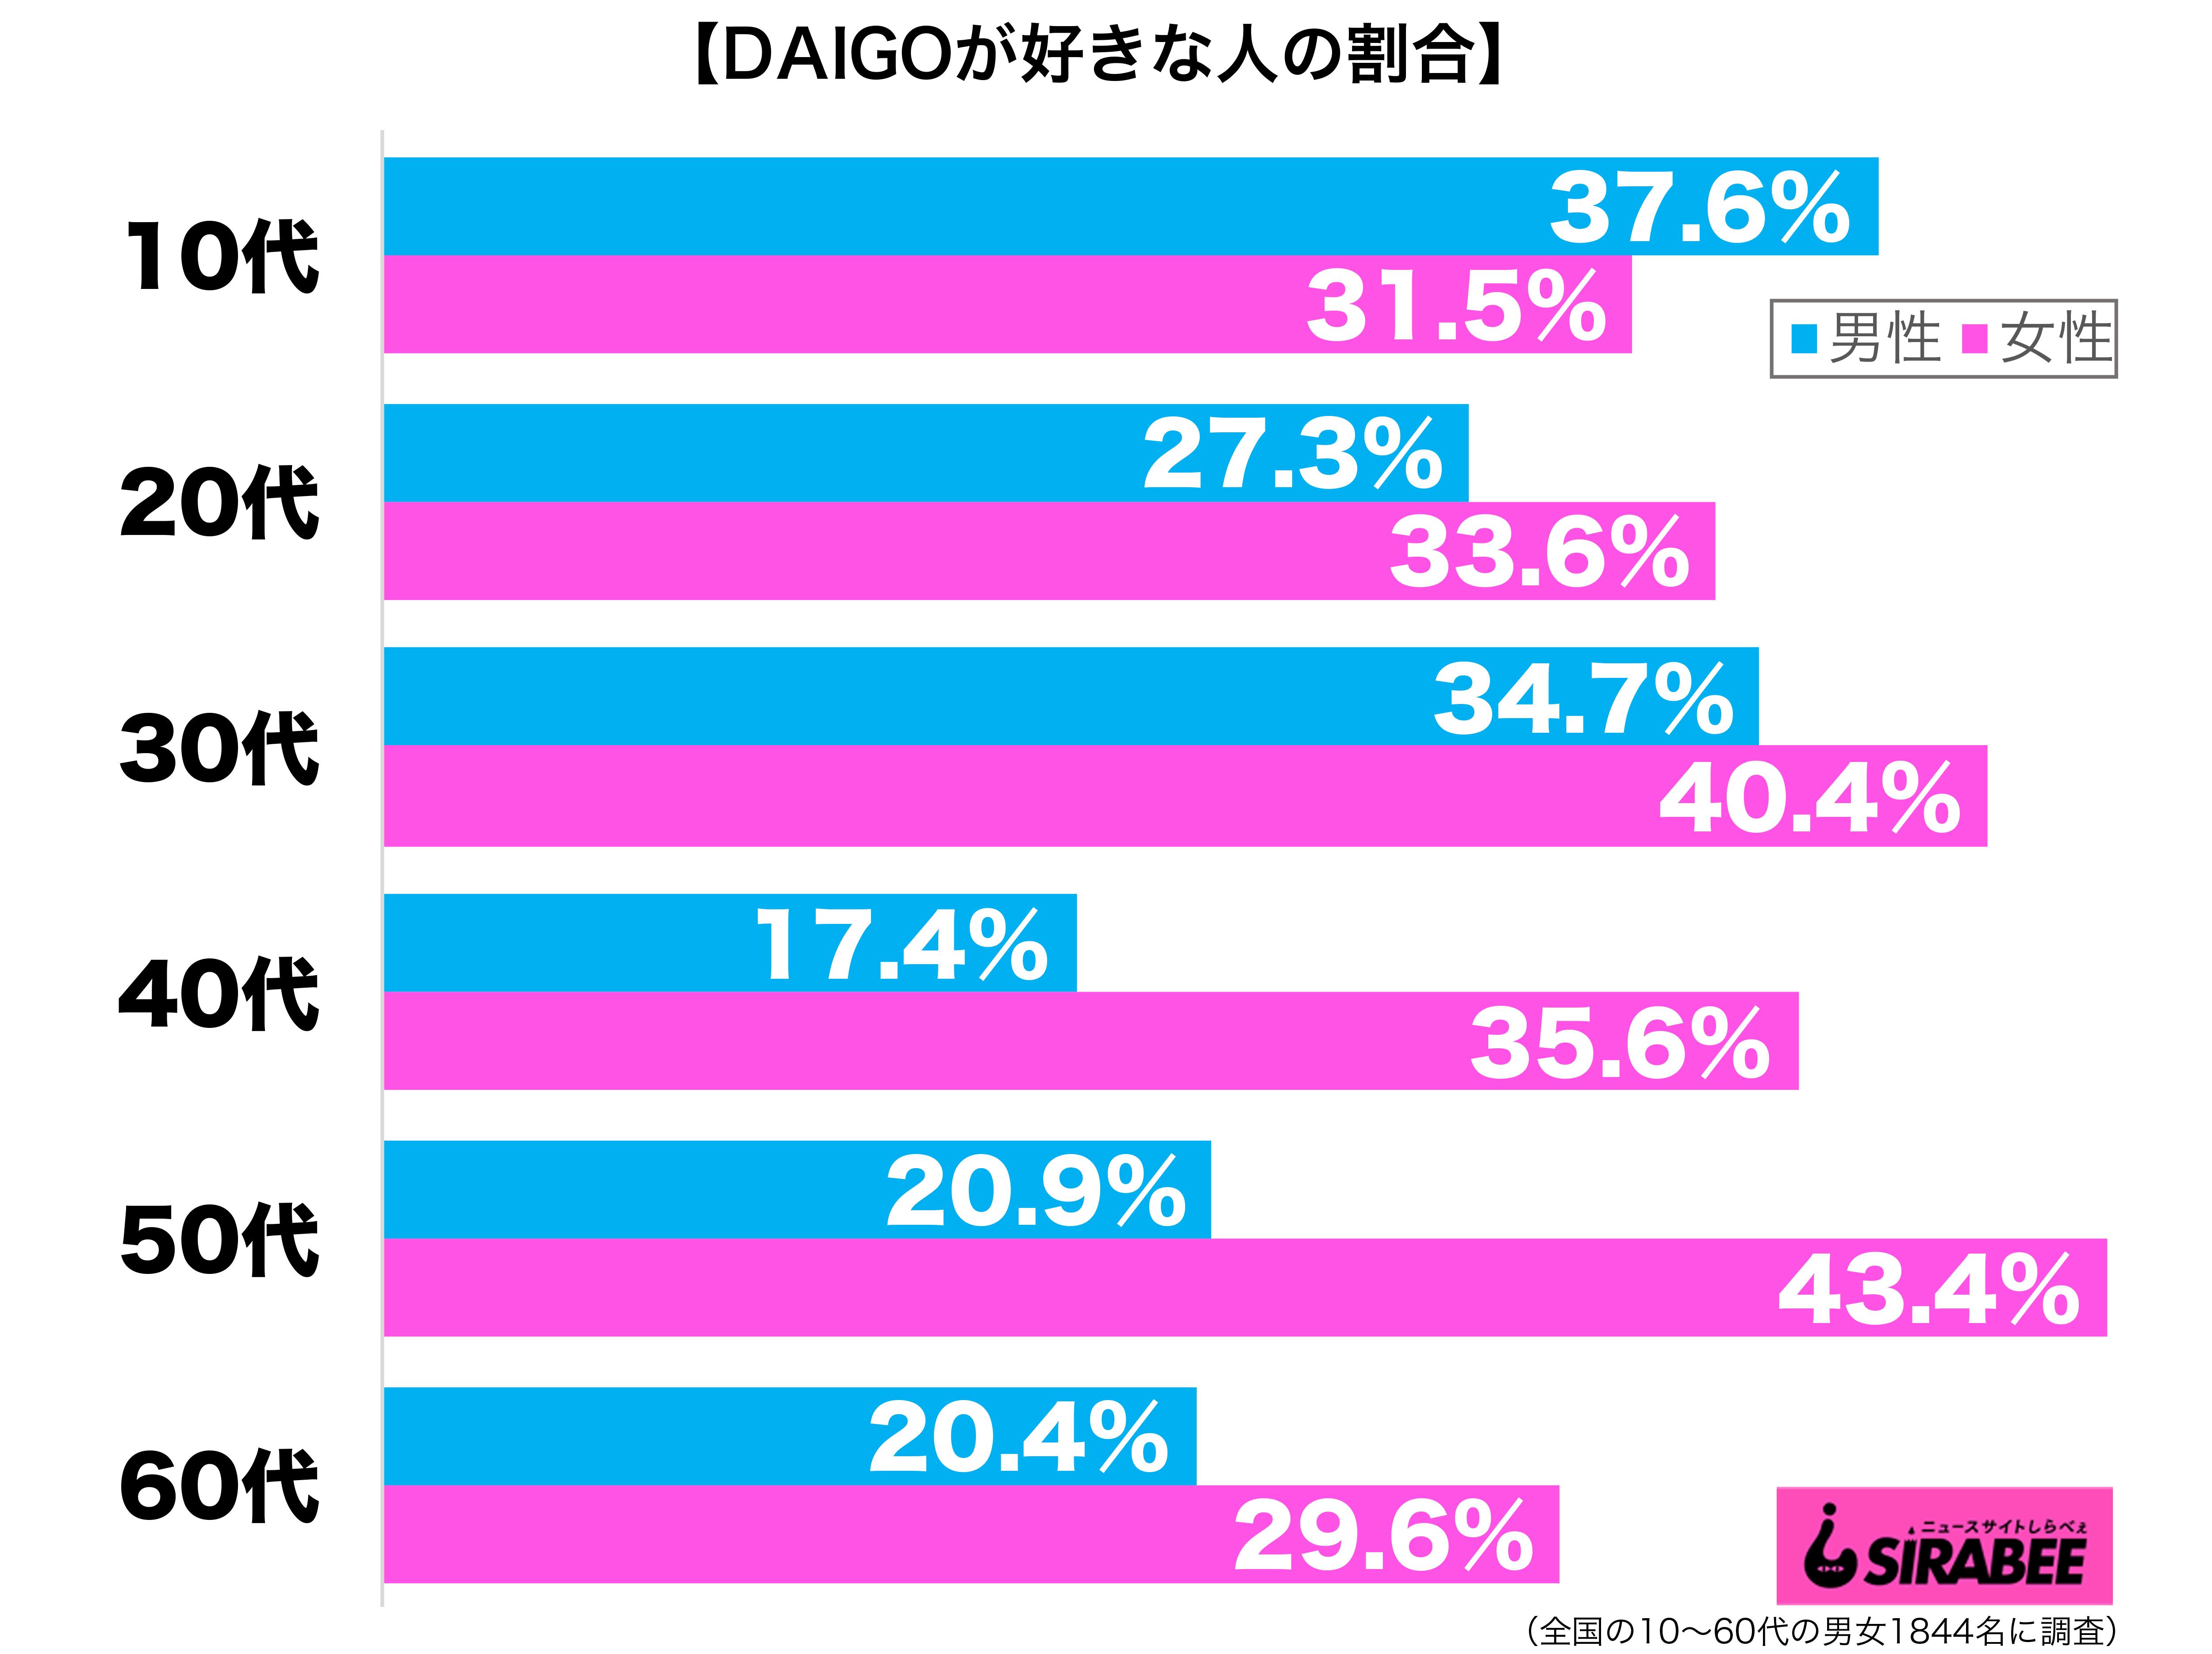 DAIGOが好き性年代別グラフ